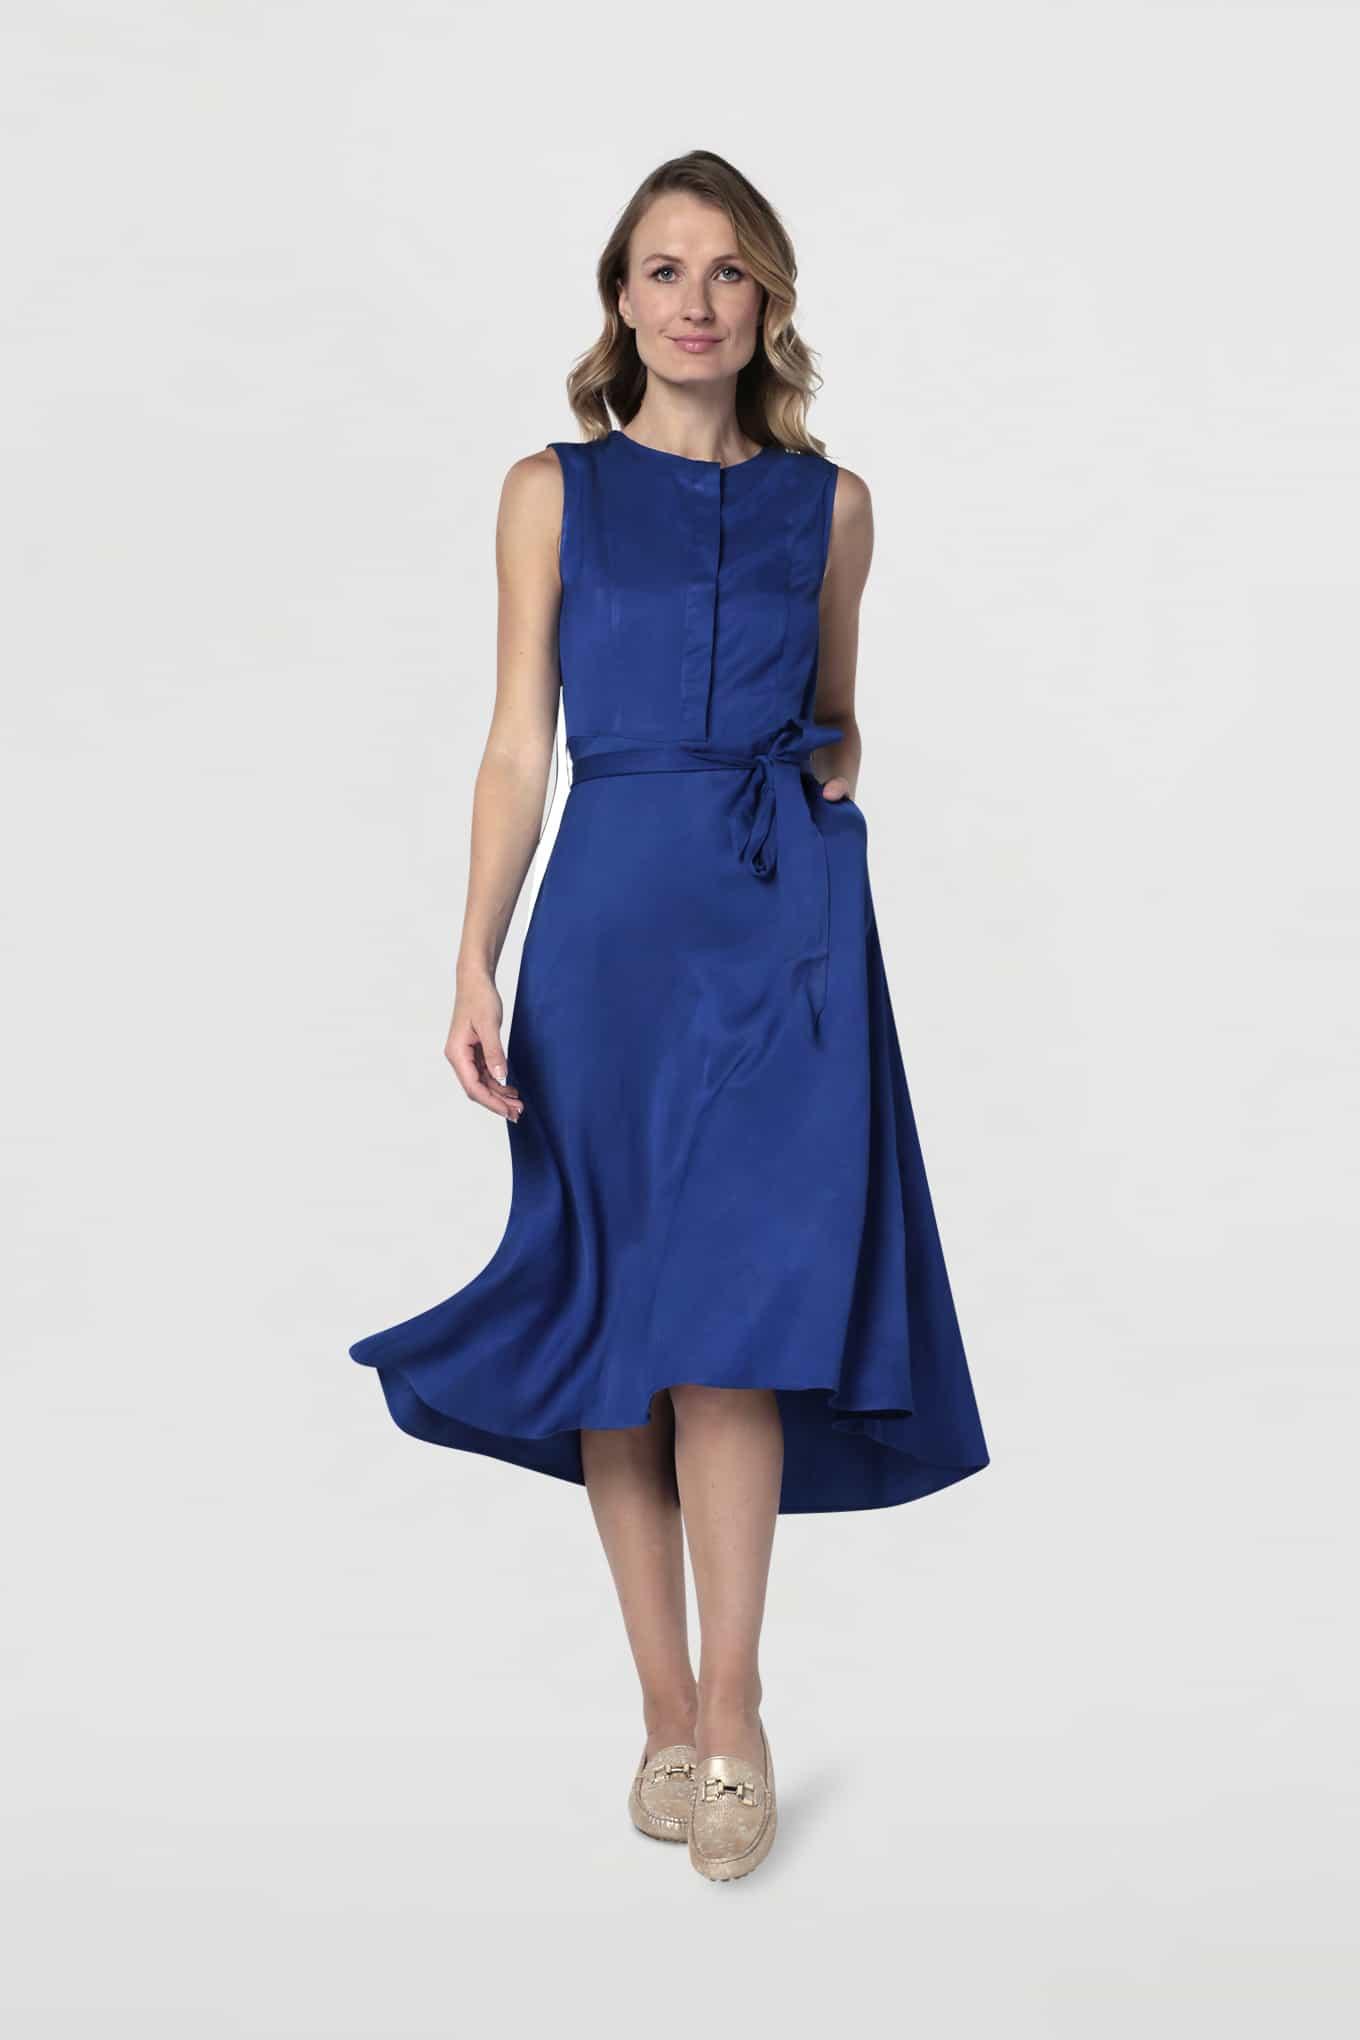 Vestido Azul Royal Fantasy Mulher